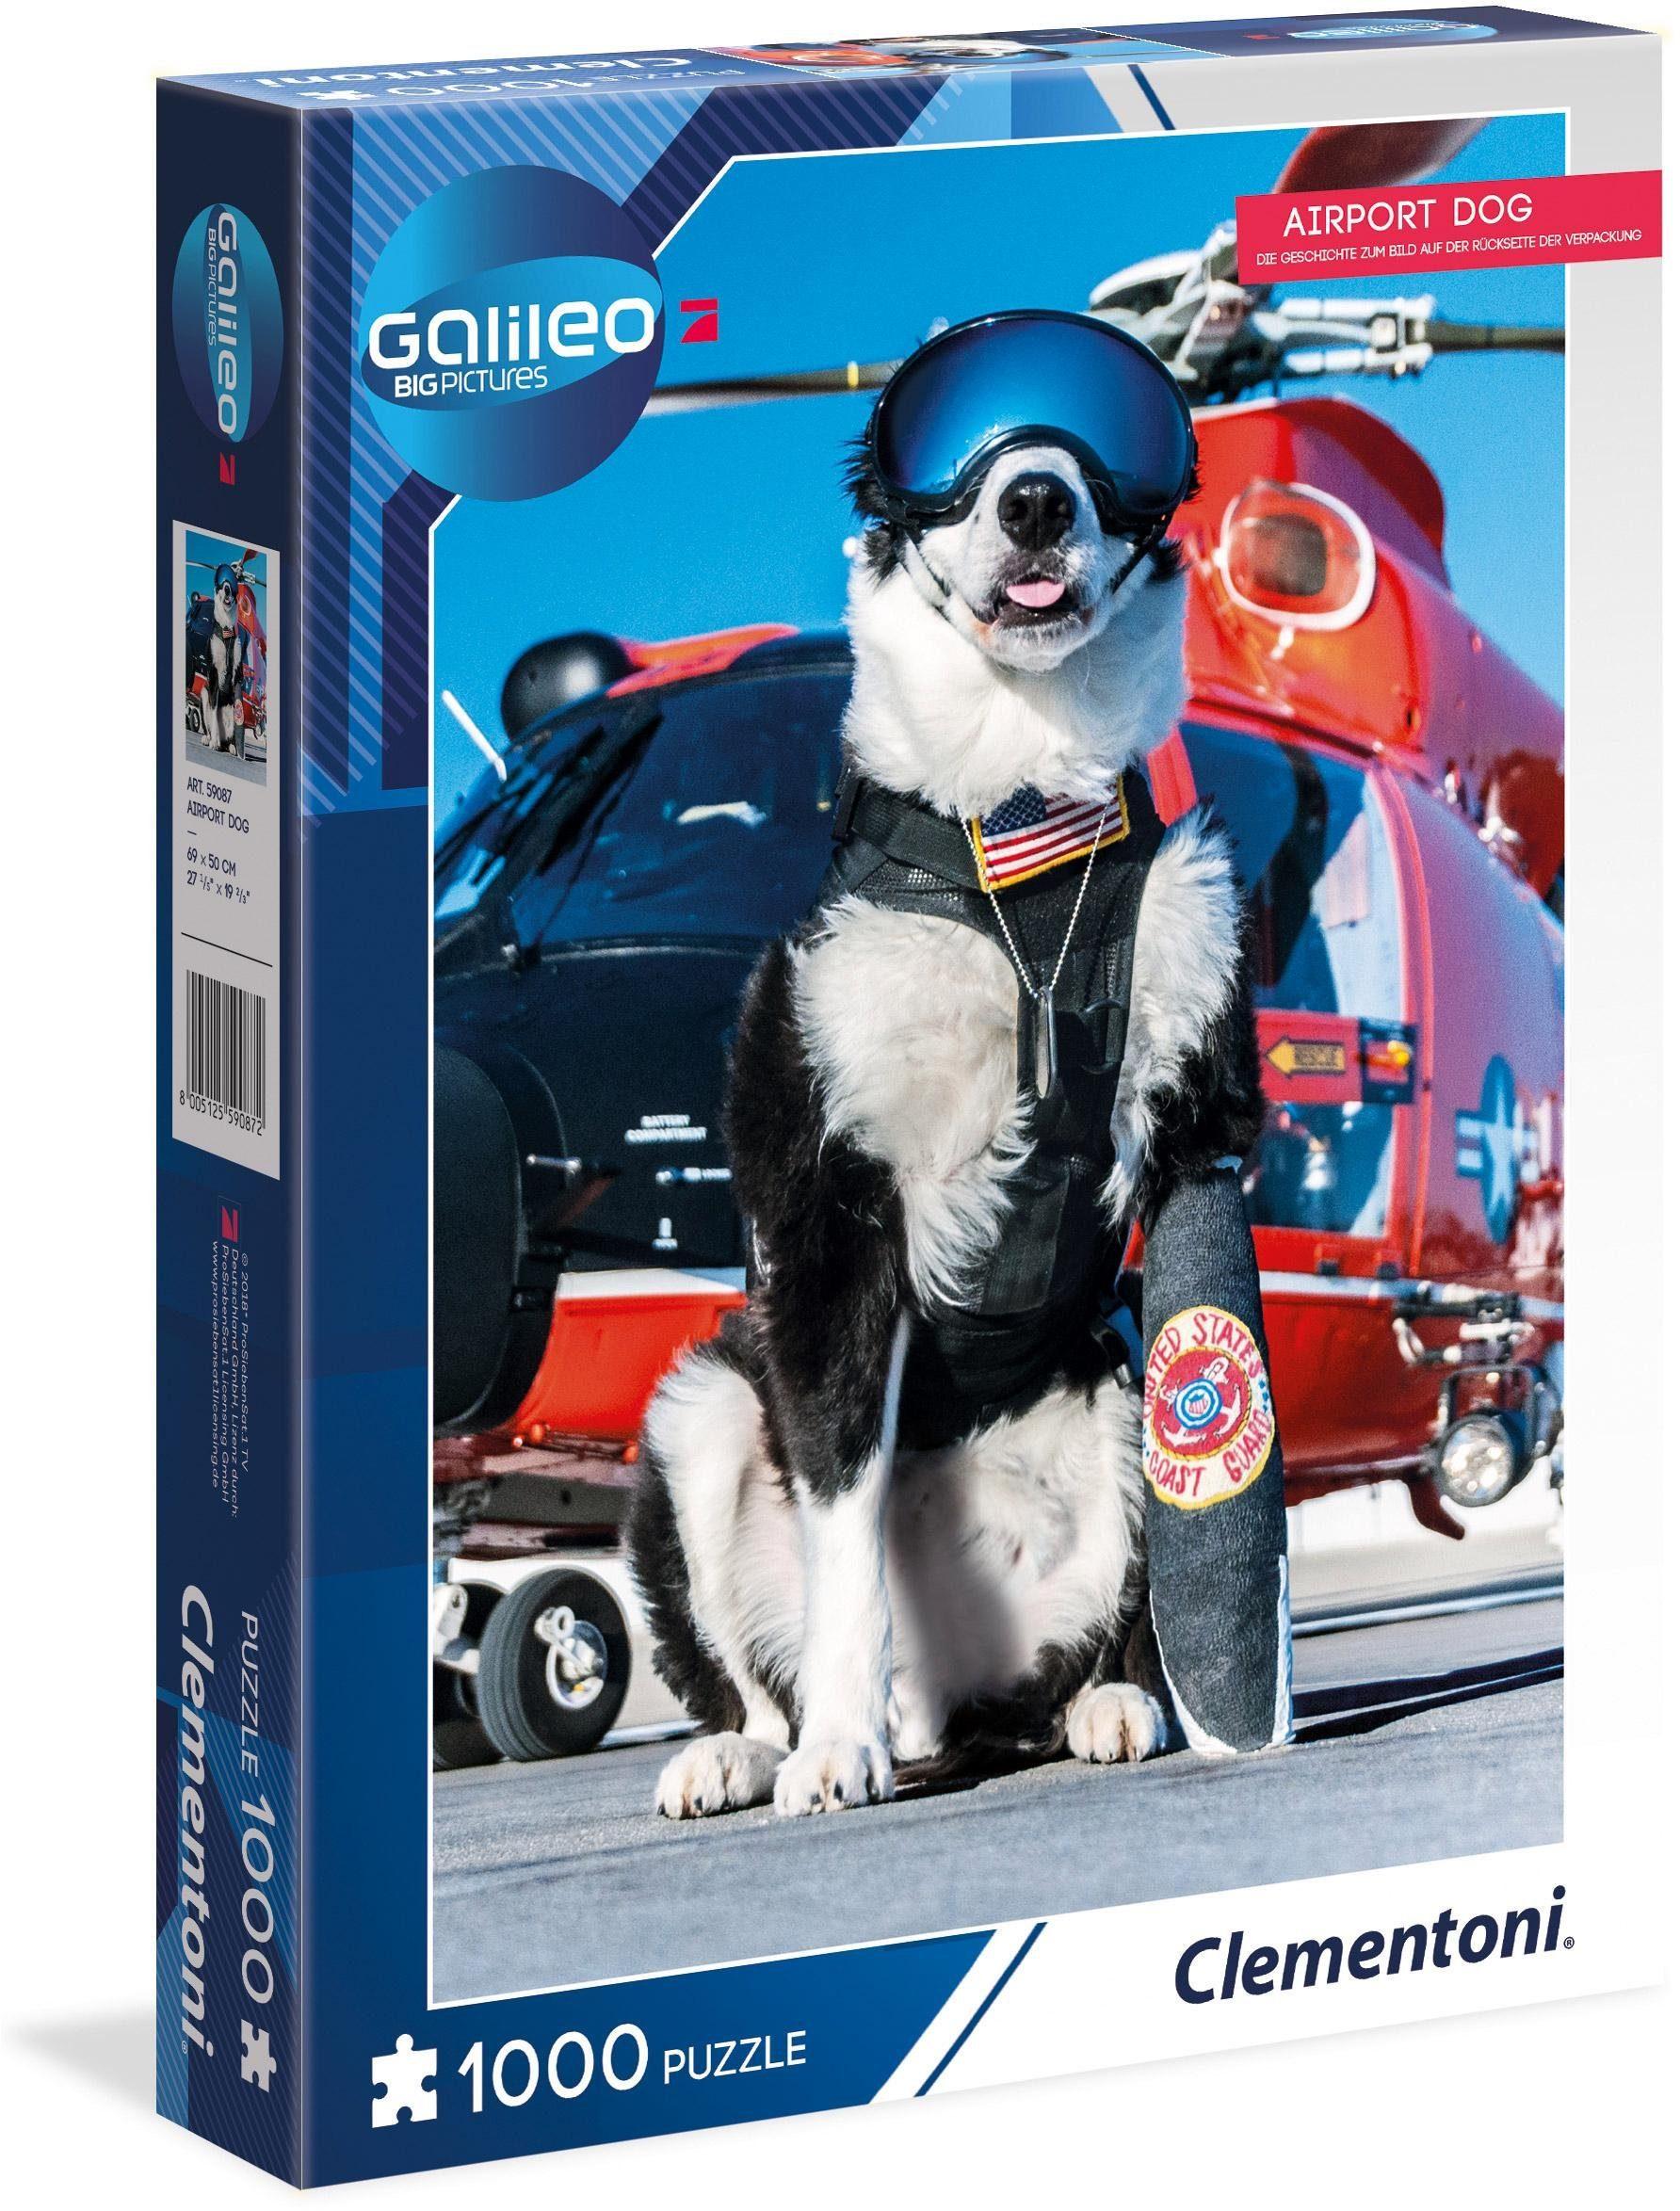 Clementoni Puzzle, 1000 Teile, »Galileo Airport Dog«